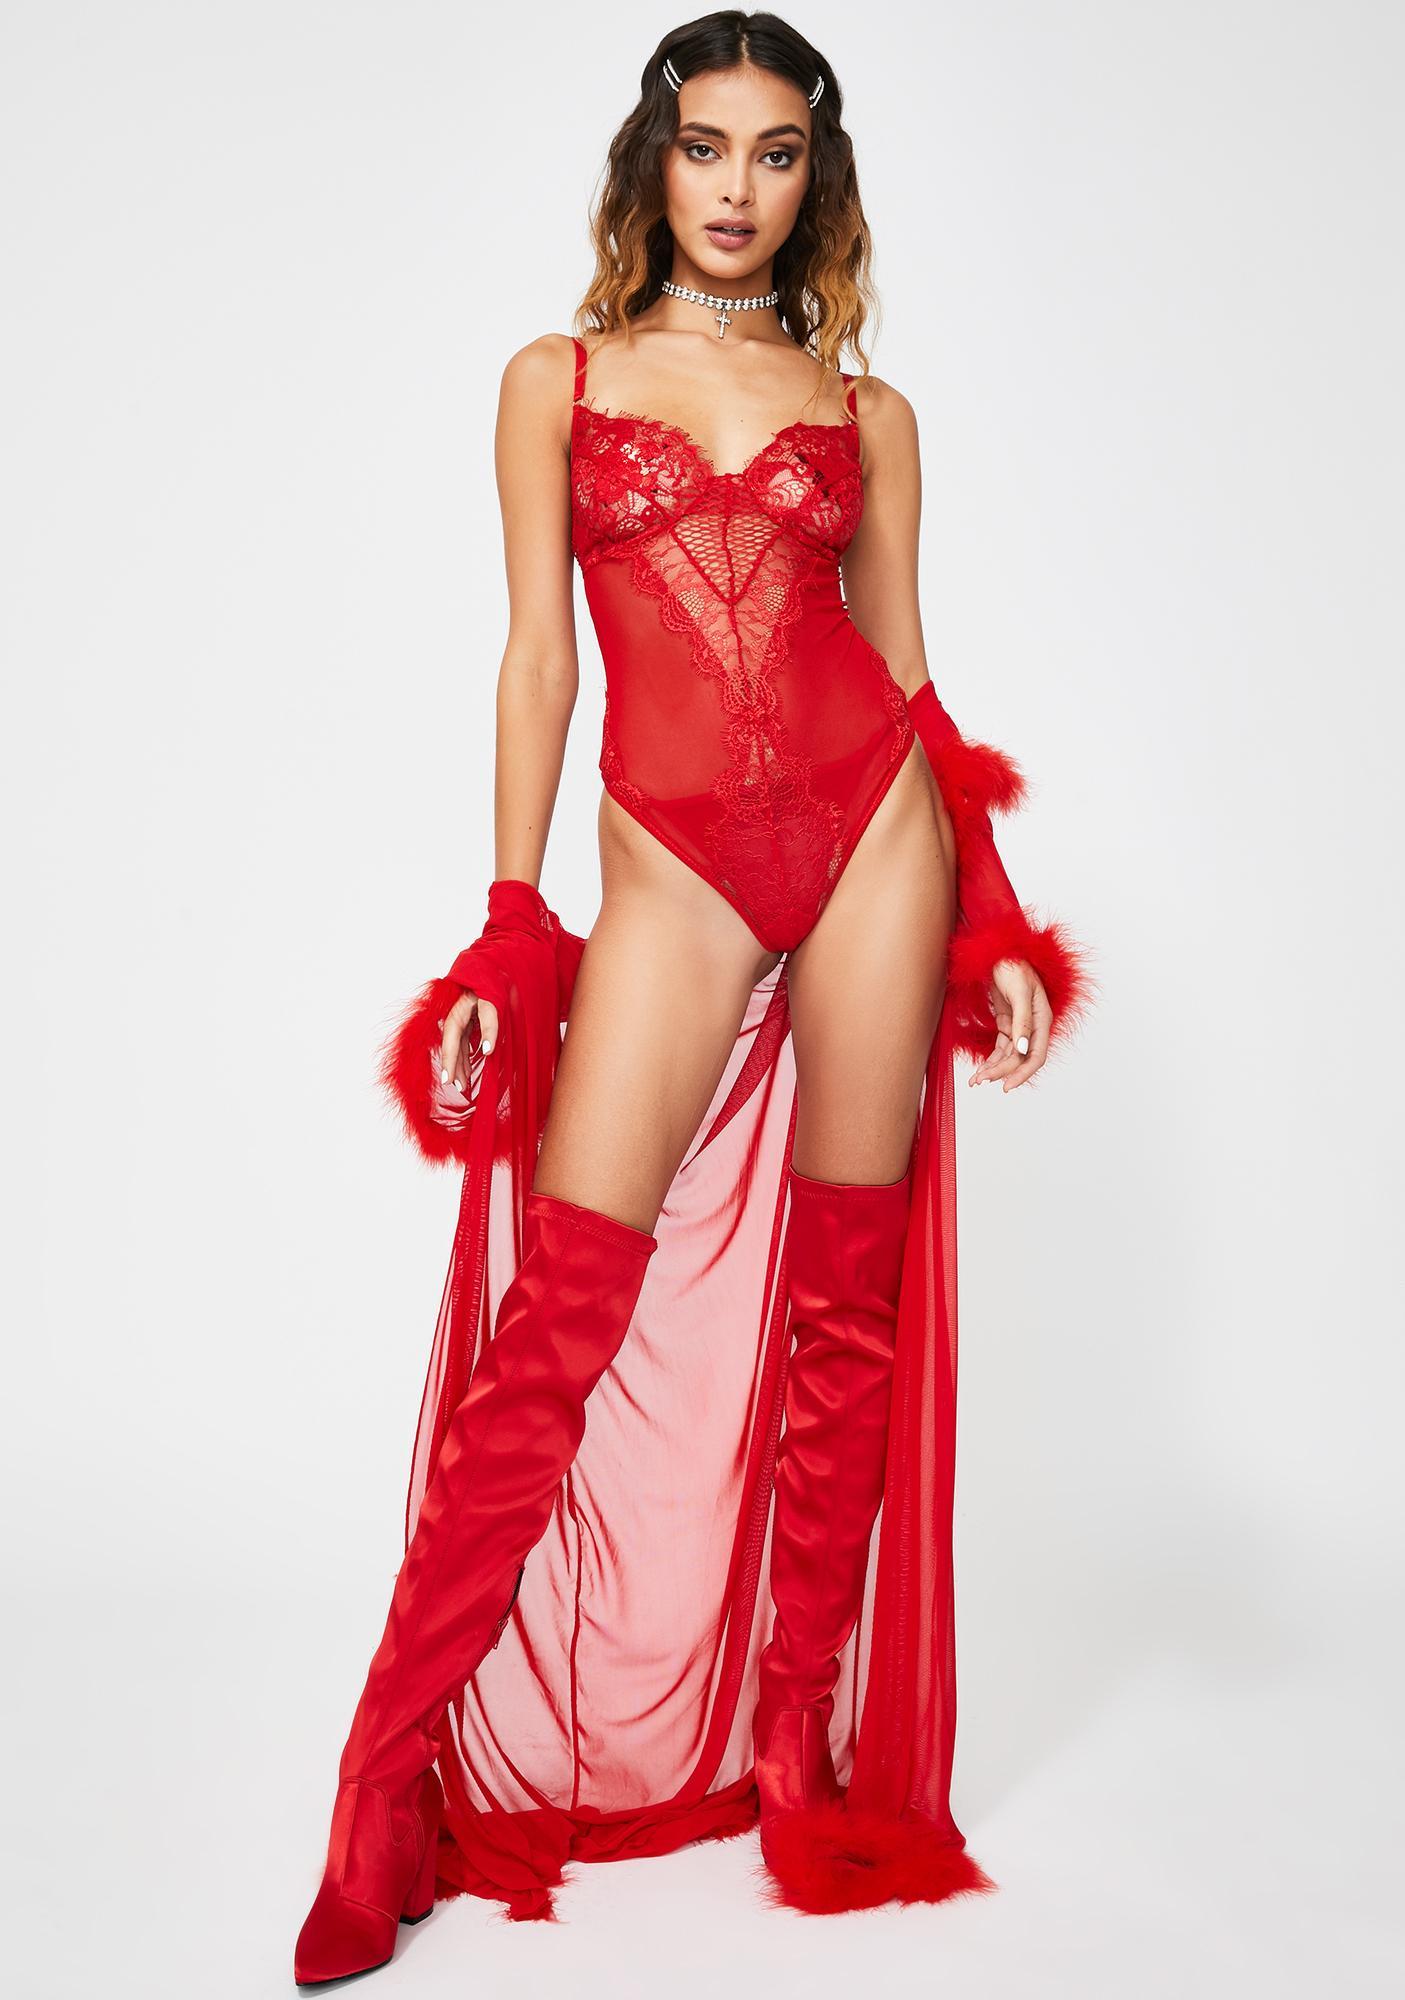 Scarlet Mistress Lace Teddy